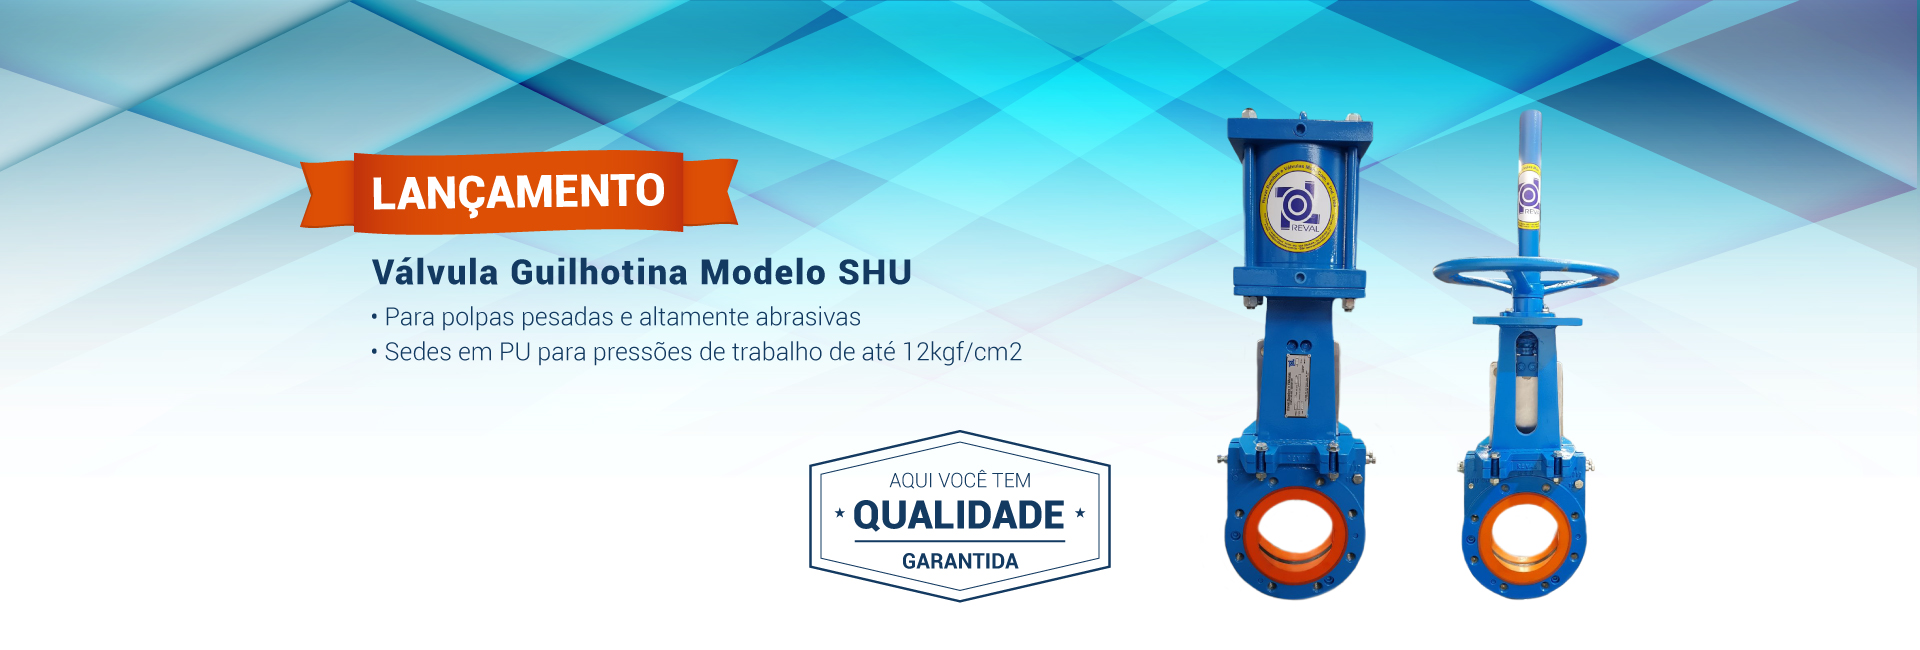 Válvula Guilhotina - Modelo SHU